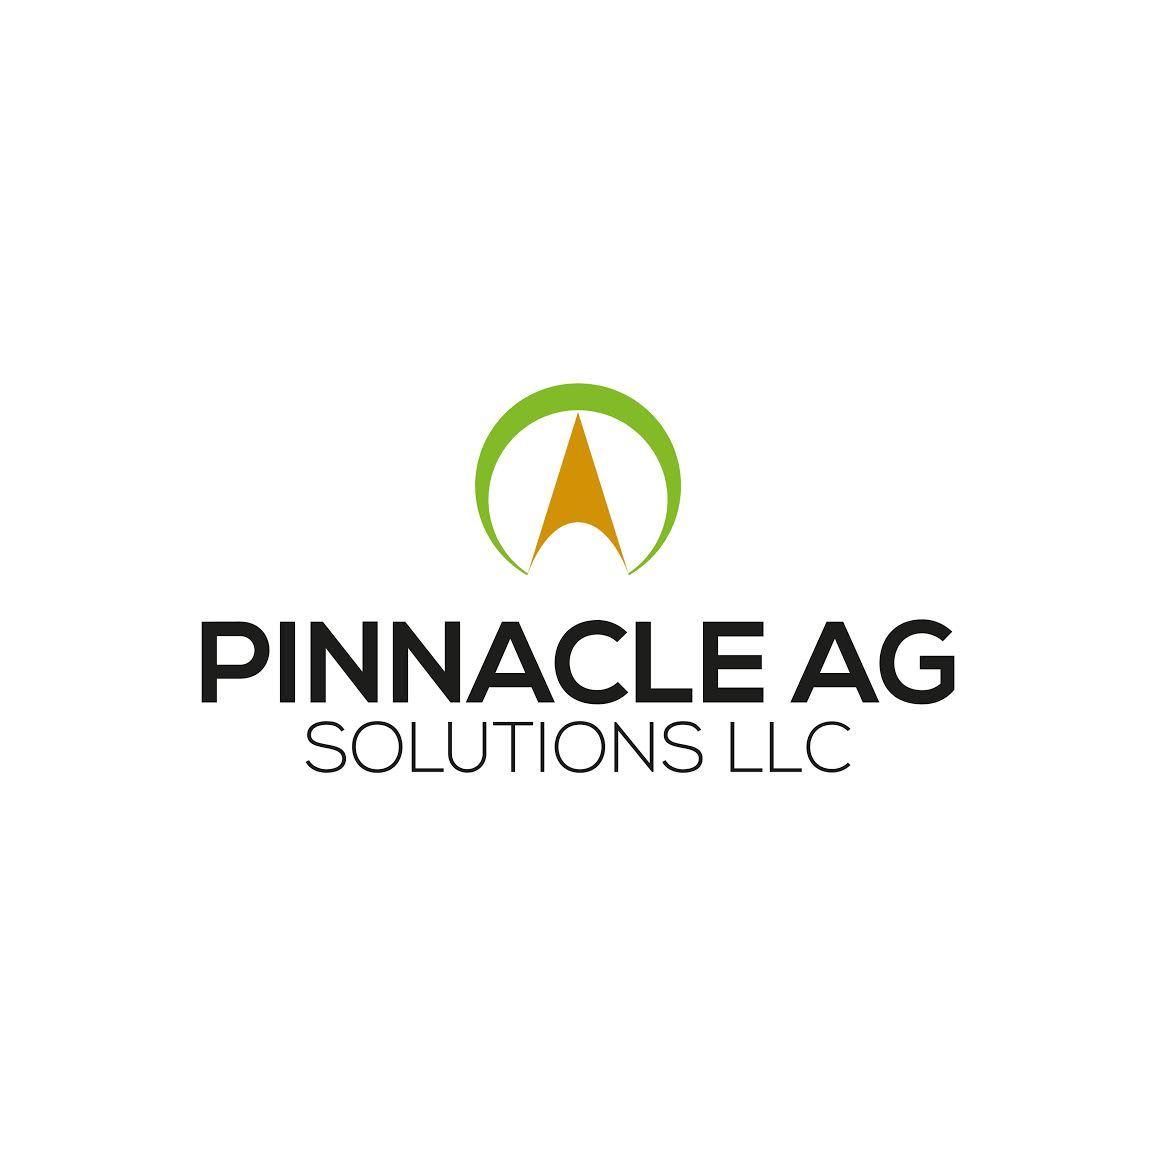 Pinnacle Ag Solutions